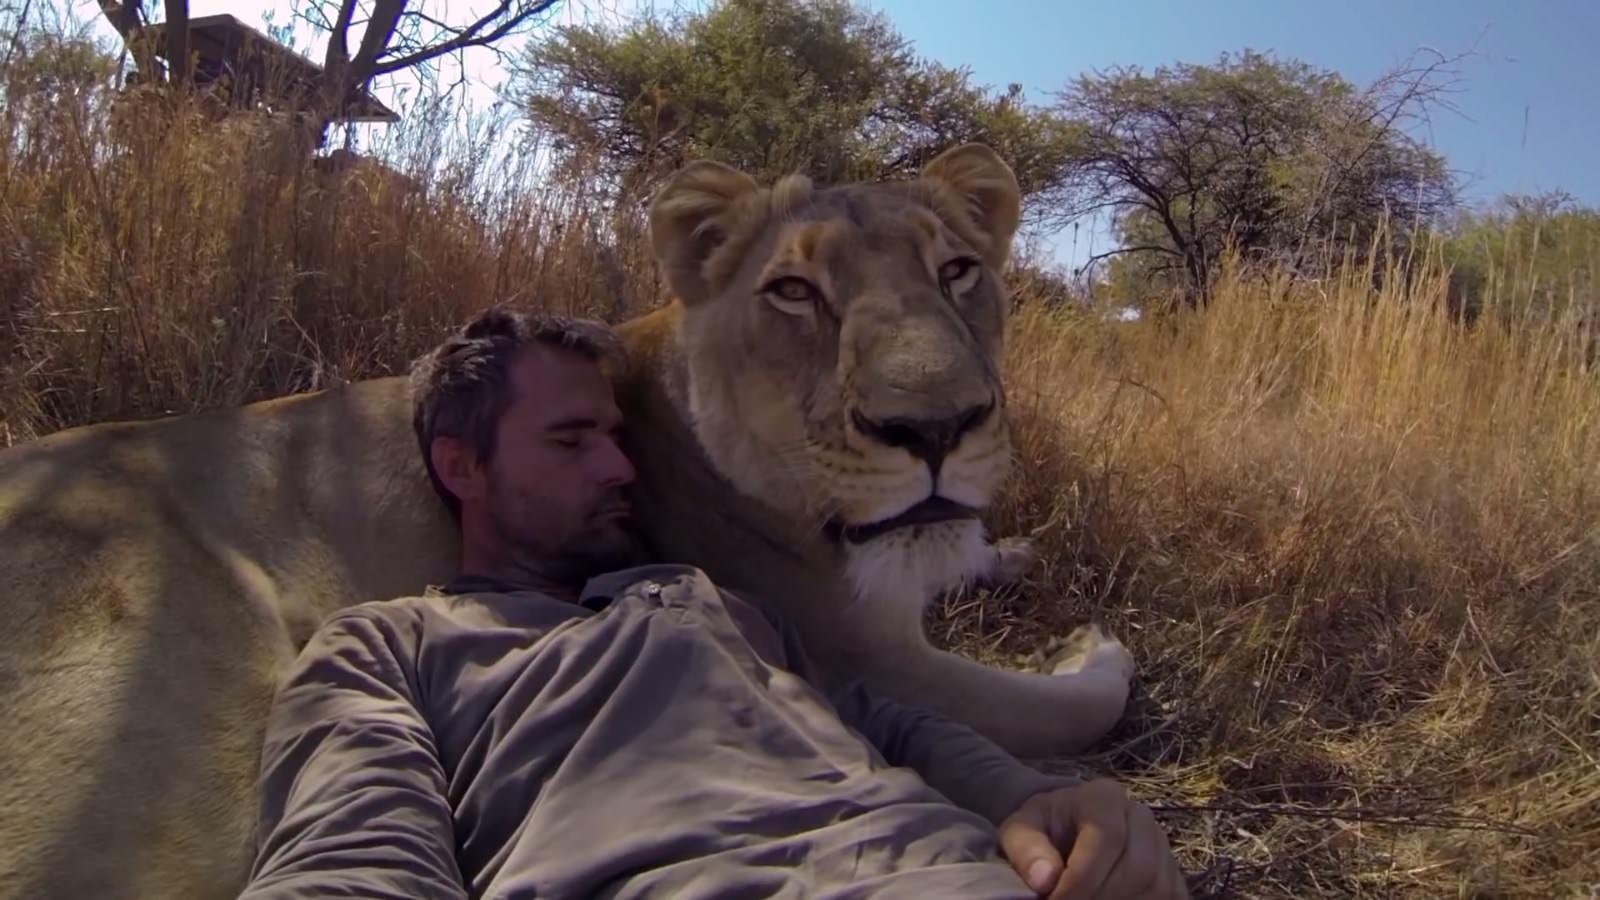 homme lion calin 2